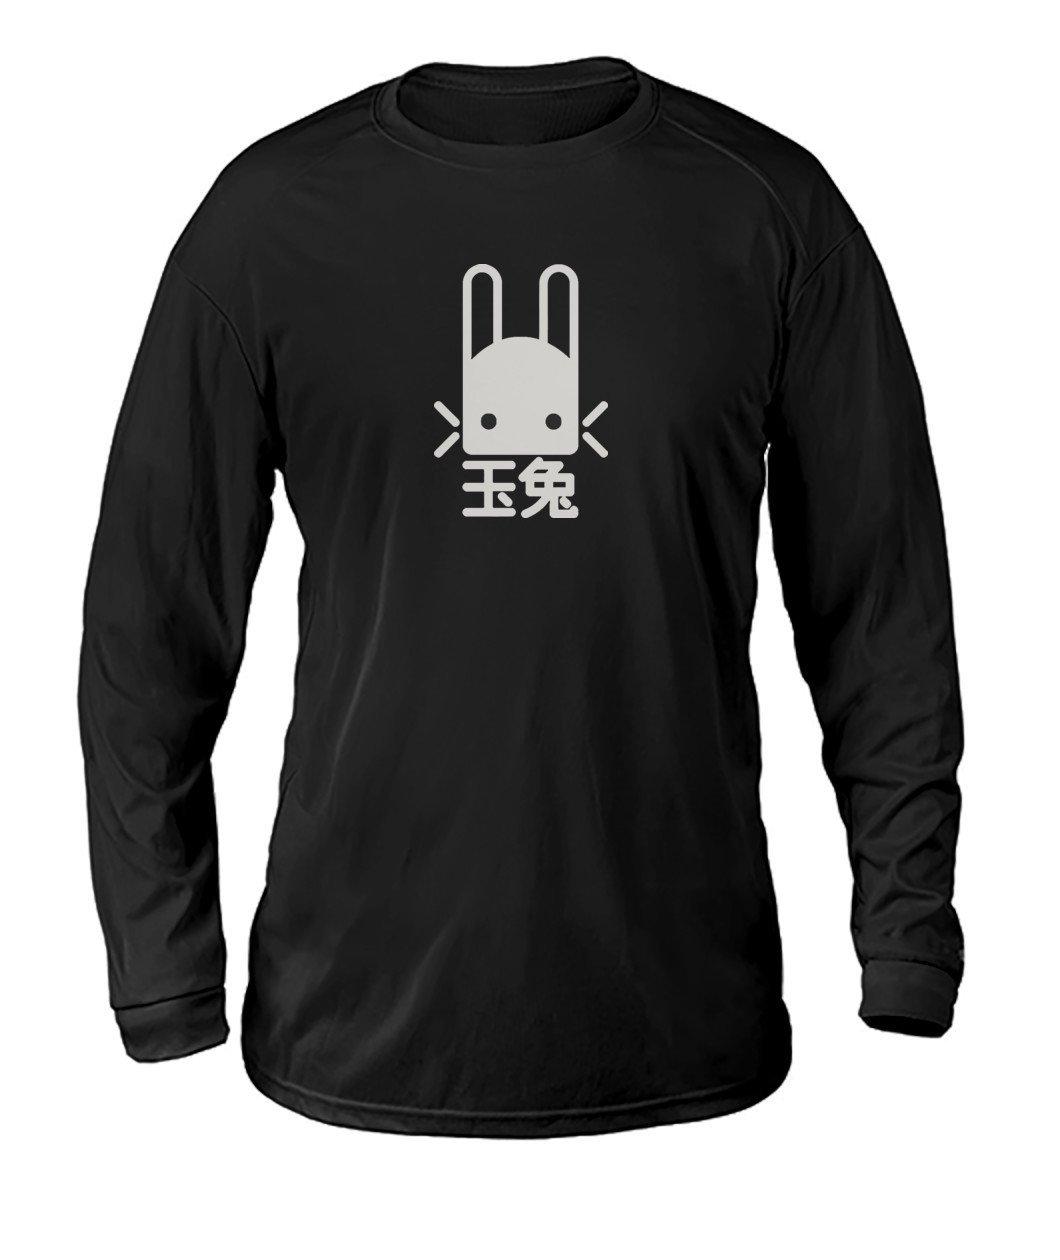 Shop From 1000 Unique Jade Rabbit Shirt Dry Sport